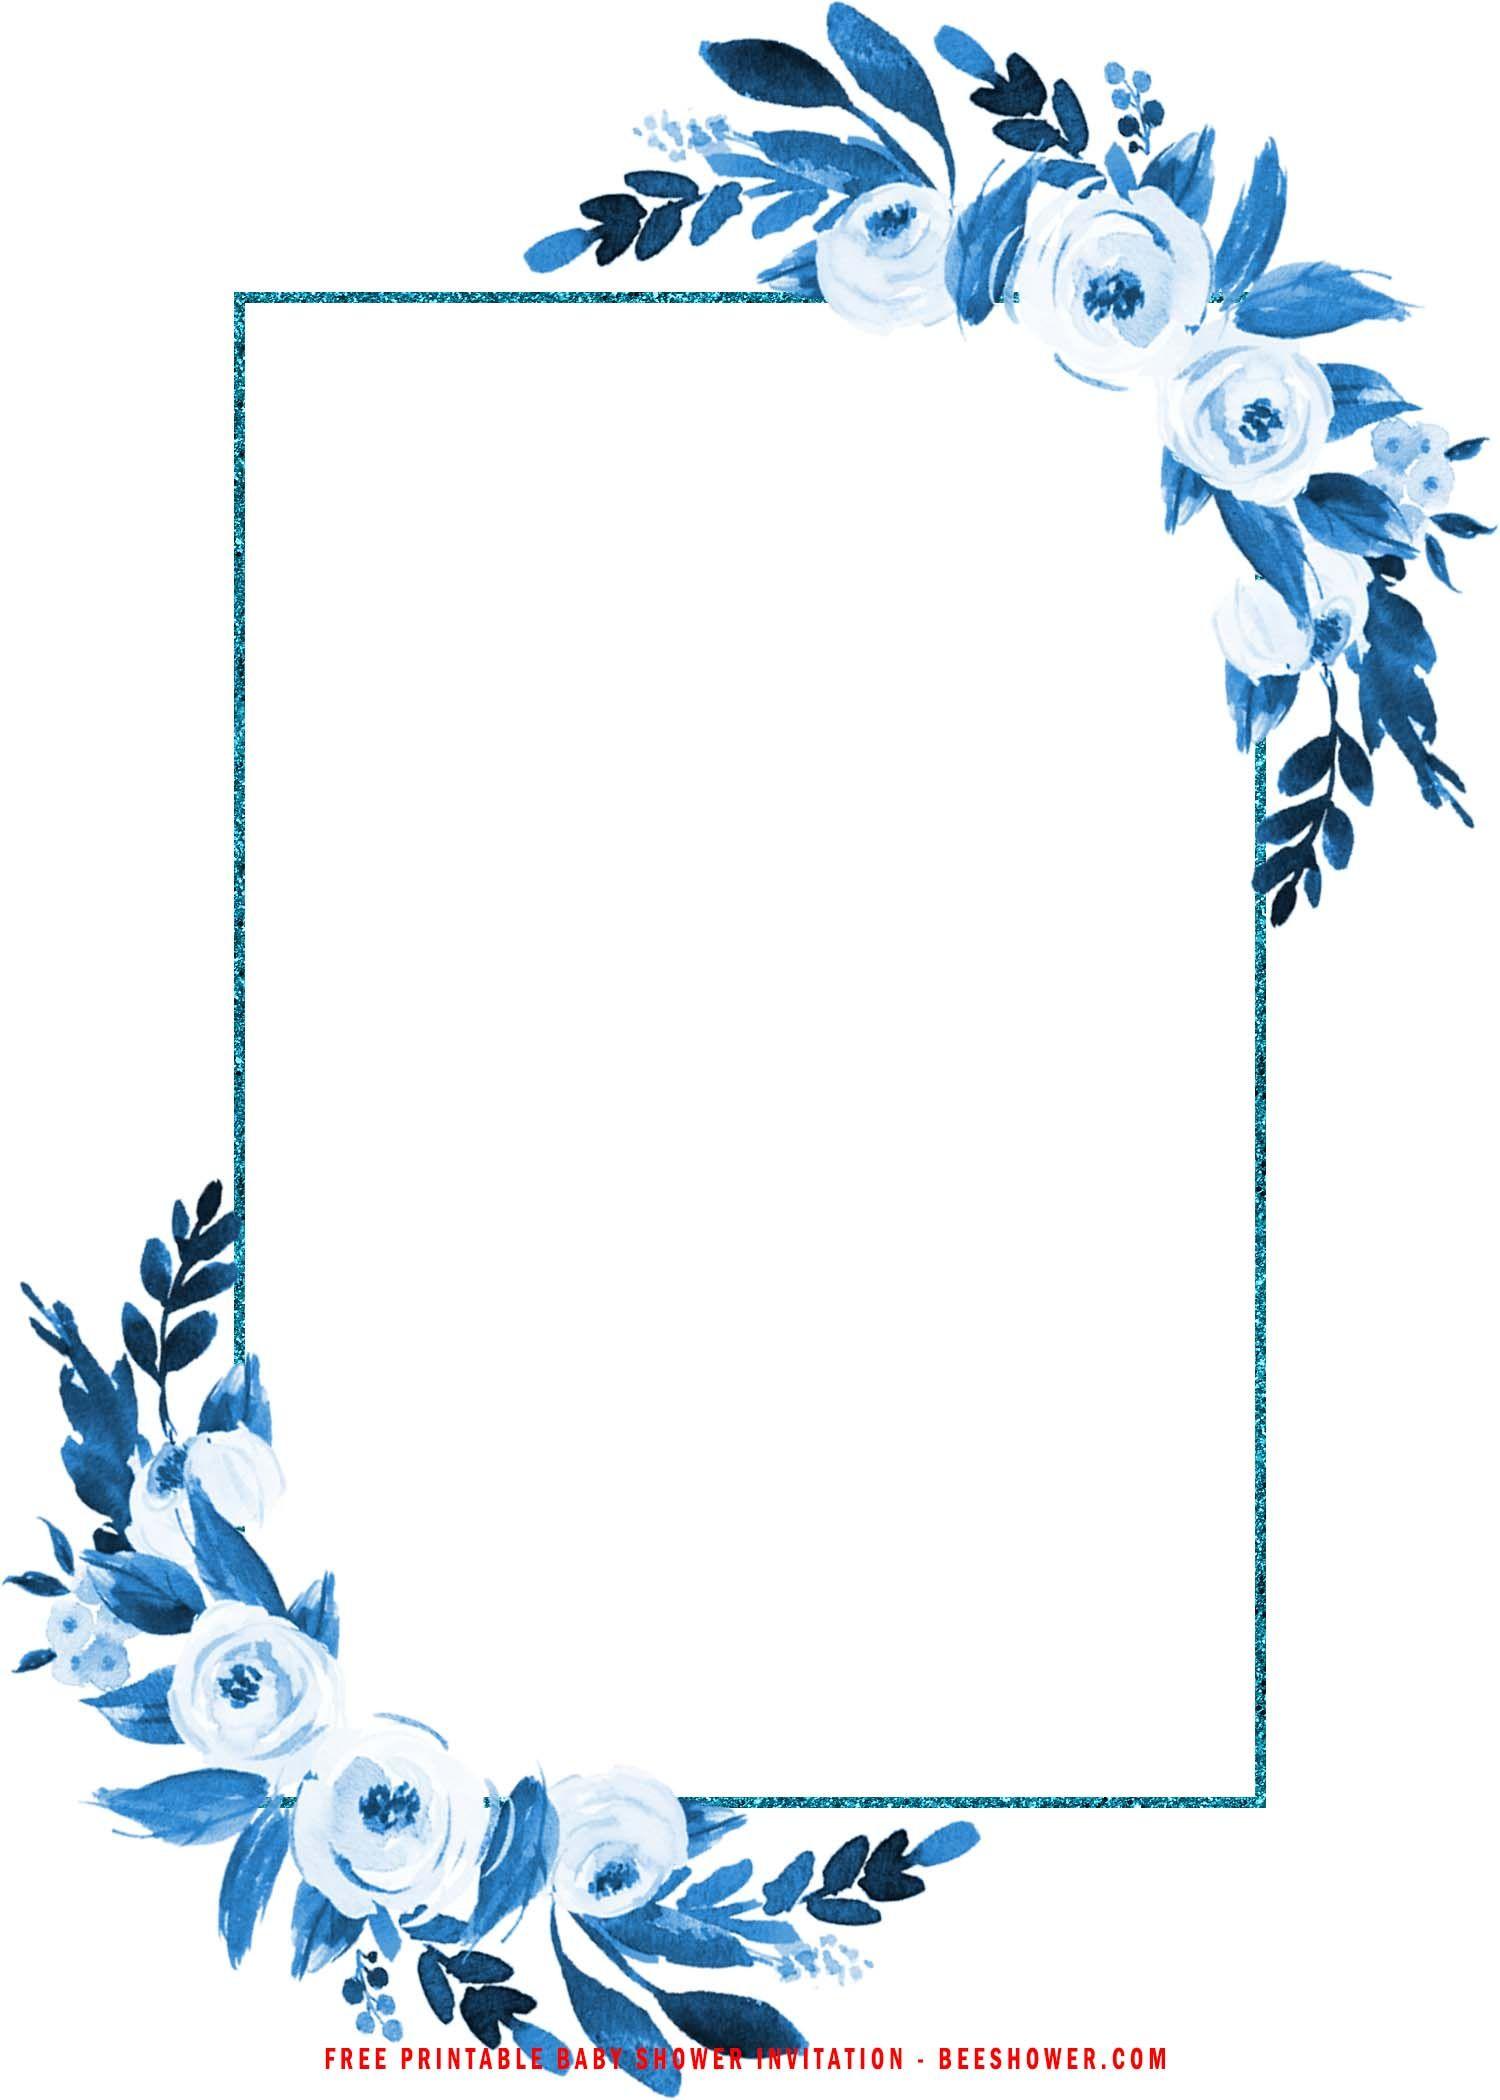 Diy Editable Pdf Bridal Shower Invitation Diy Summer Rustic Bridal Shower Invitations Diy Bridal Shower Invitations Free Sunflower Baby Shower Invitations